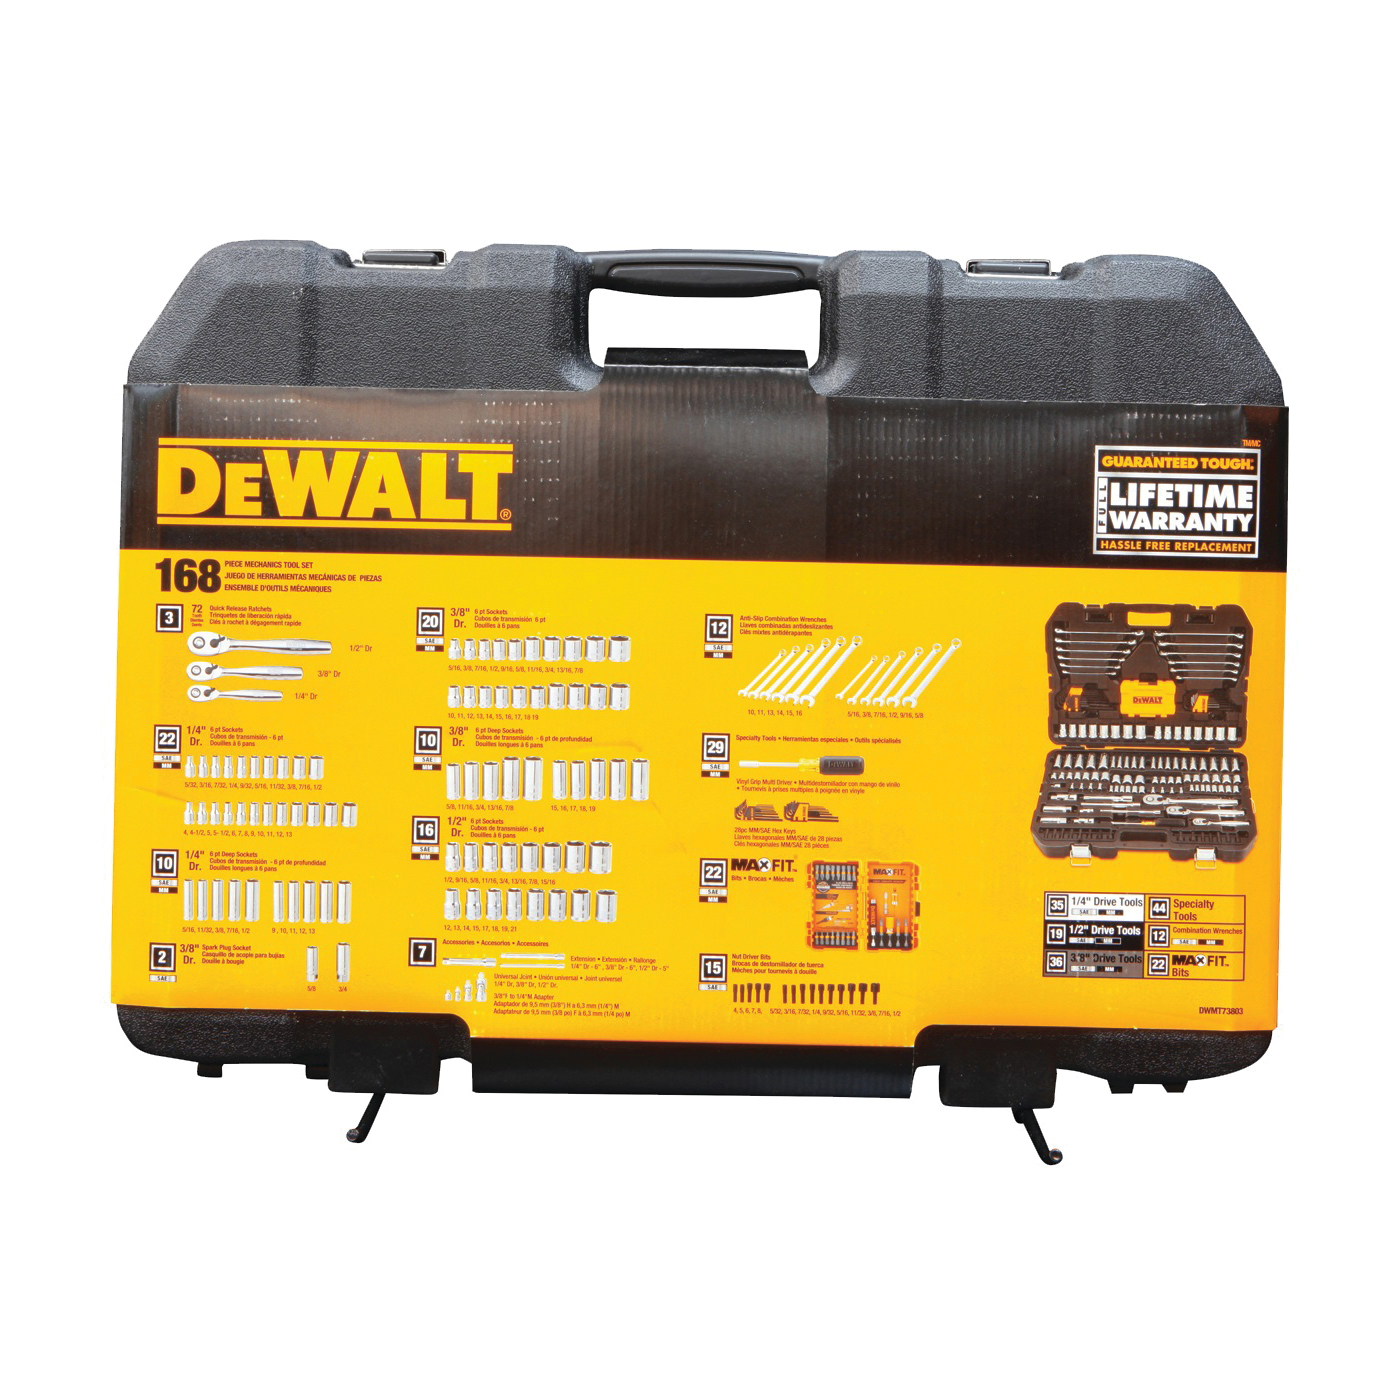 Picture of DeWALT DWMT73803 Mechanics Tool Set, 168 -Piece, Chrome Vanadium, Polished Chrome Vanadium